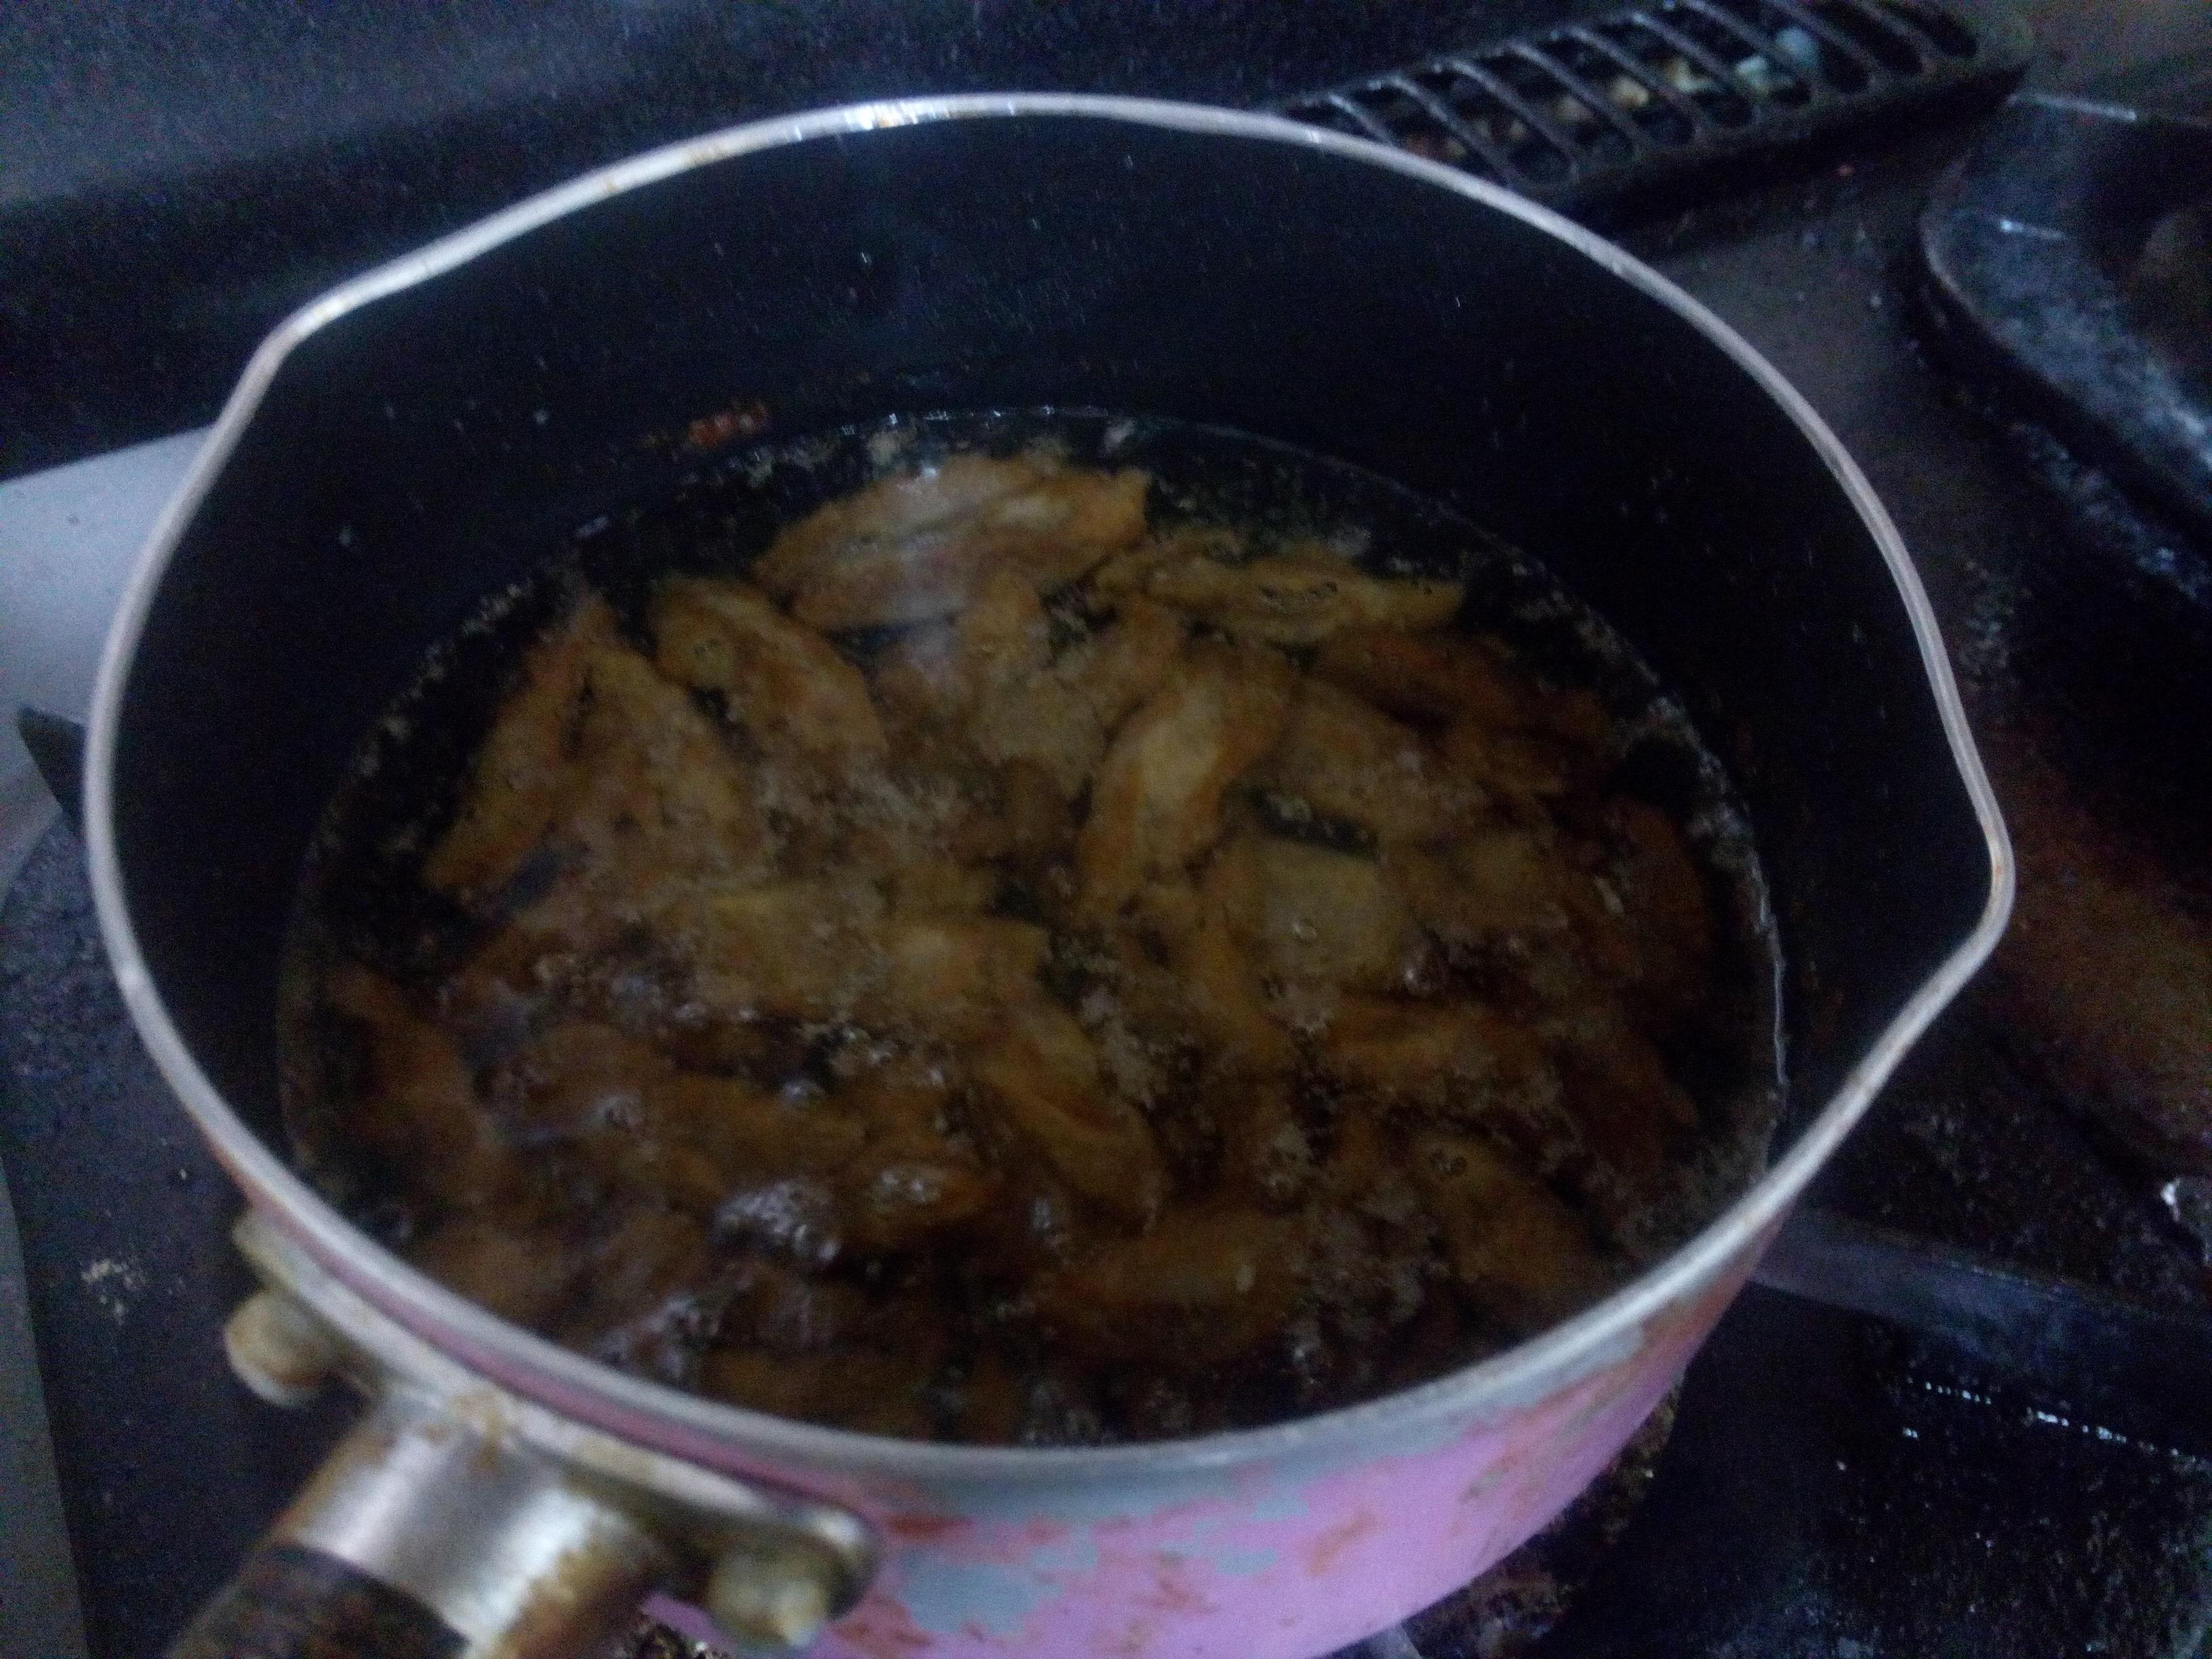 Frying..